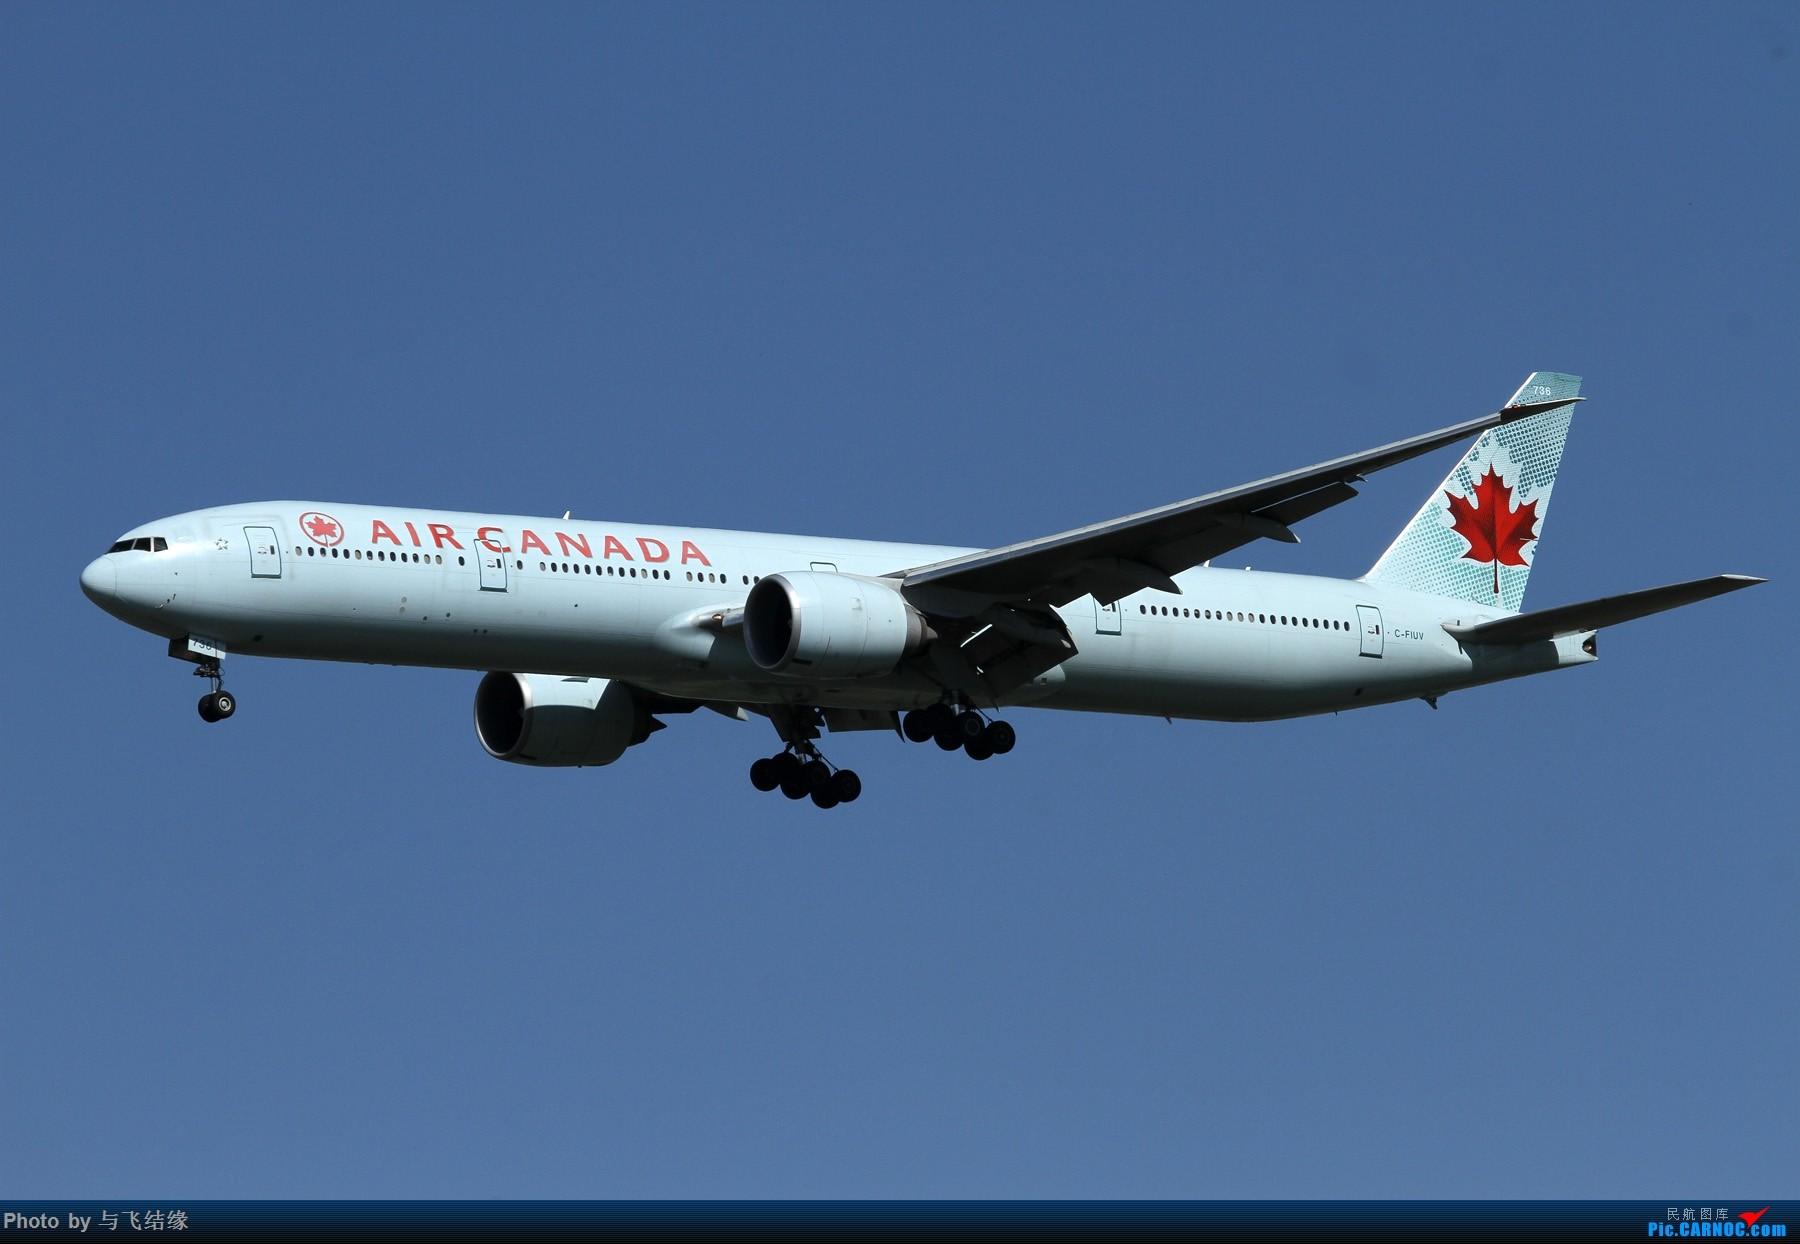 Re:[原创]荷航,以色列航,加航! BOEING 777-300ER C-FIUV 中国北京首都国际机场